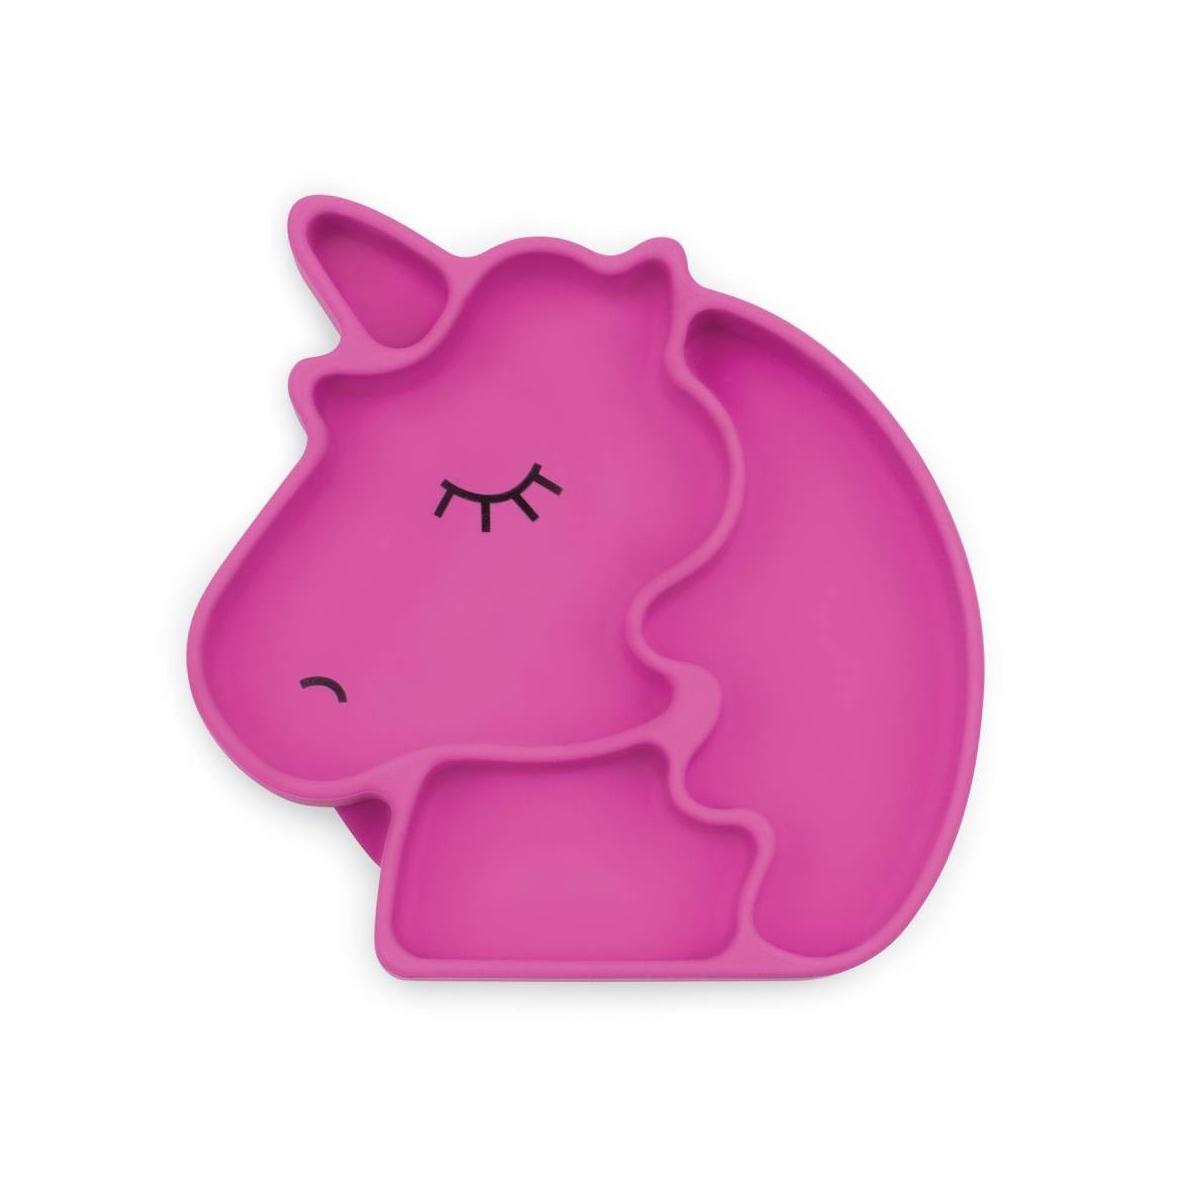 Bumkins Silicone Grip Dish-Purple Unicorn